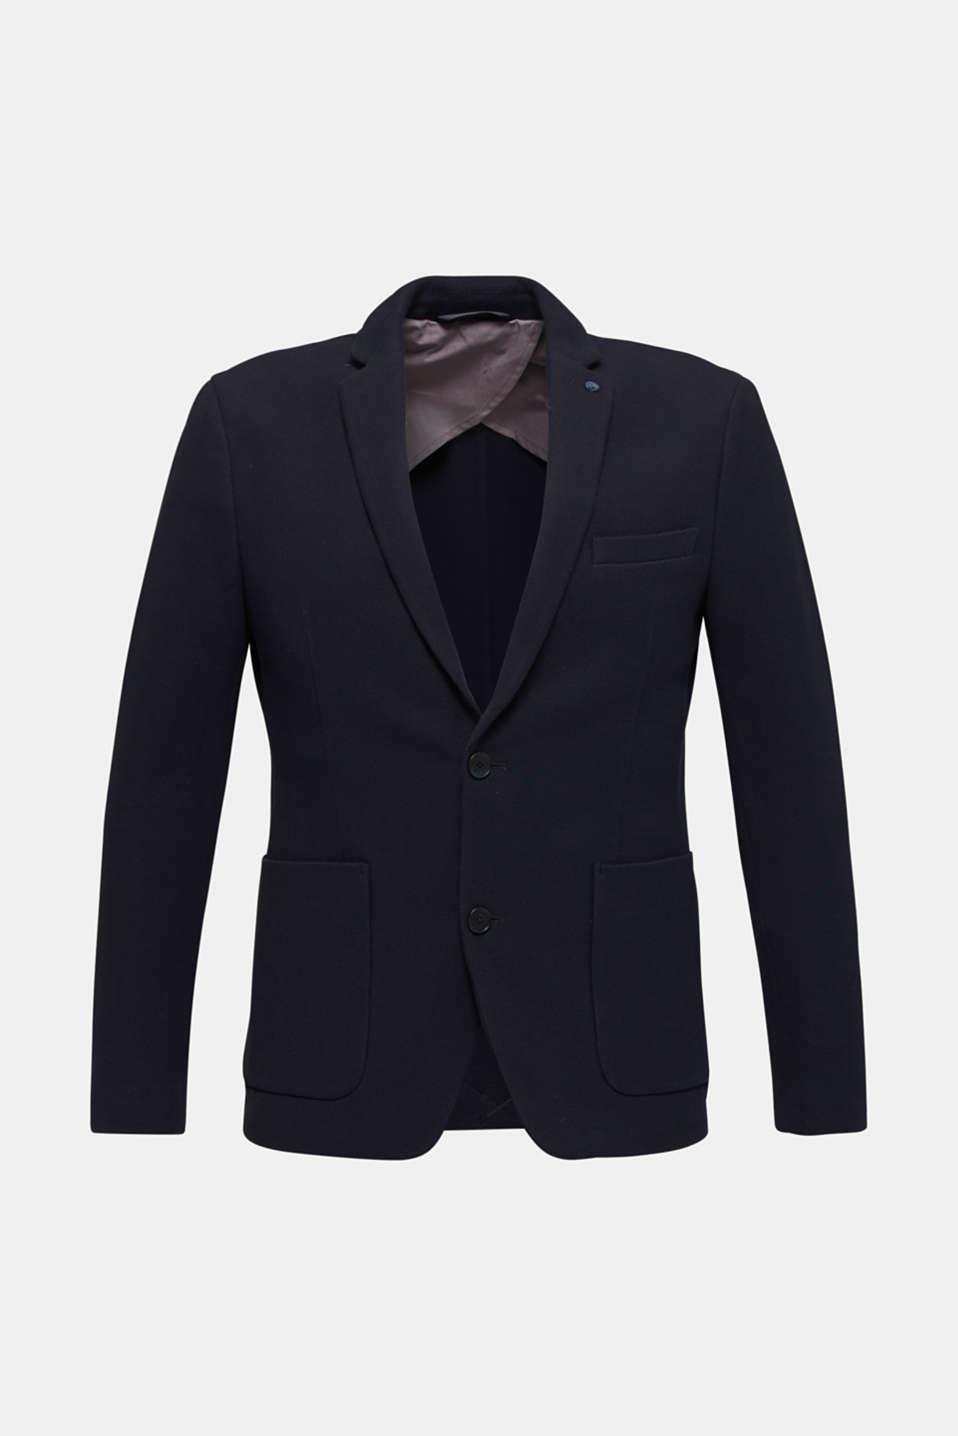 sports jacket made of 100% cotton, DARK BLUE, detail image number 7